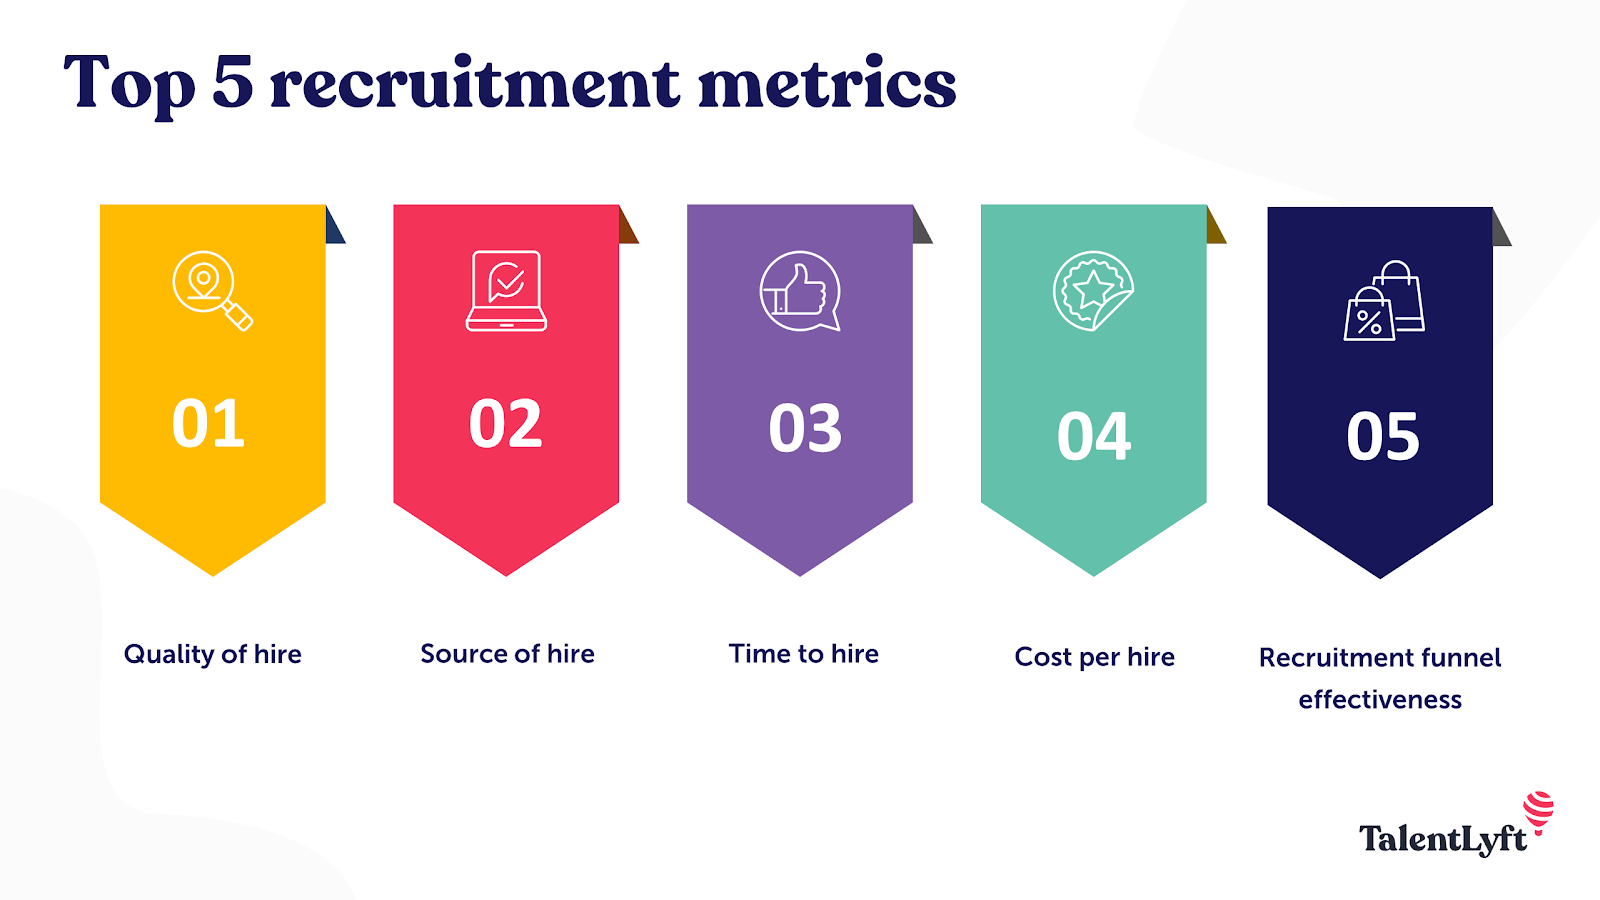 Top 5 recruitment metrics